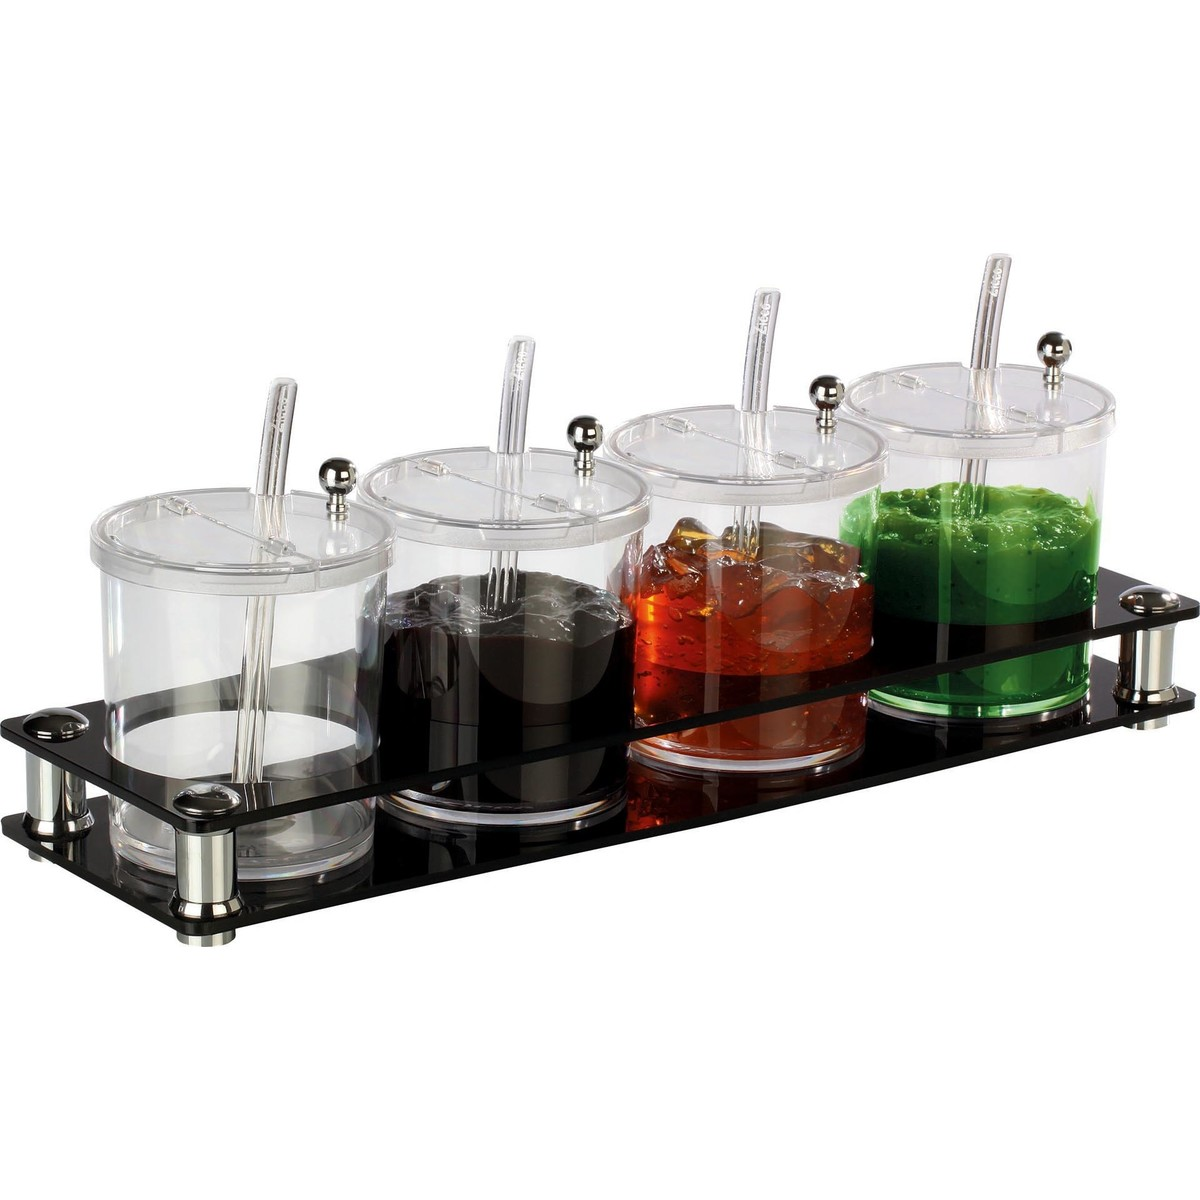 Buffetbar mit 4 Behältern